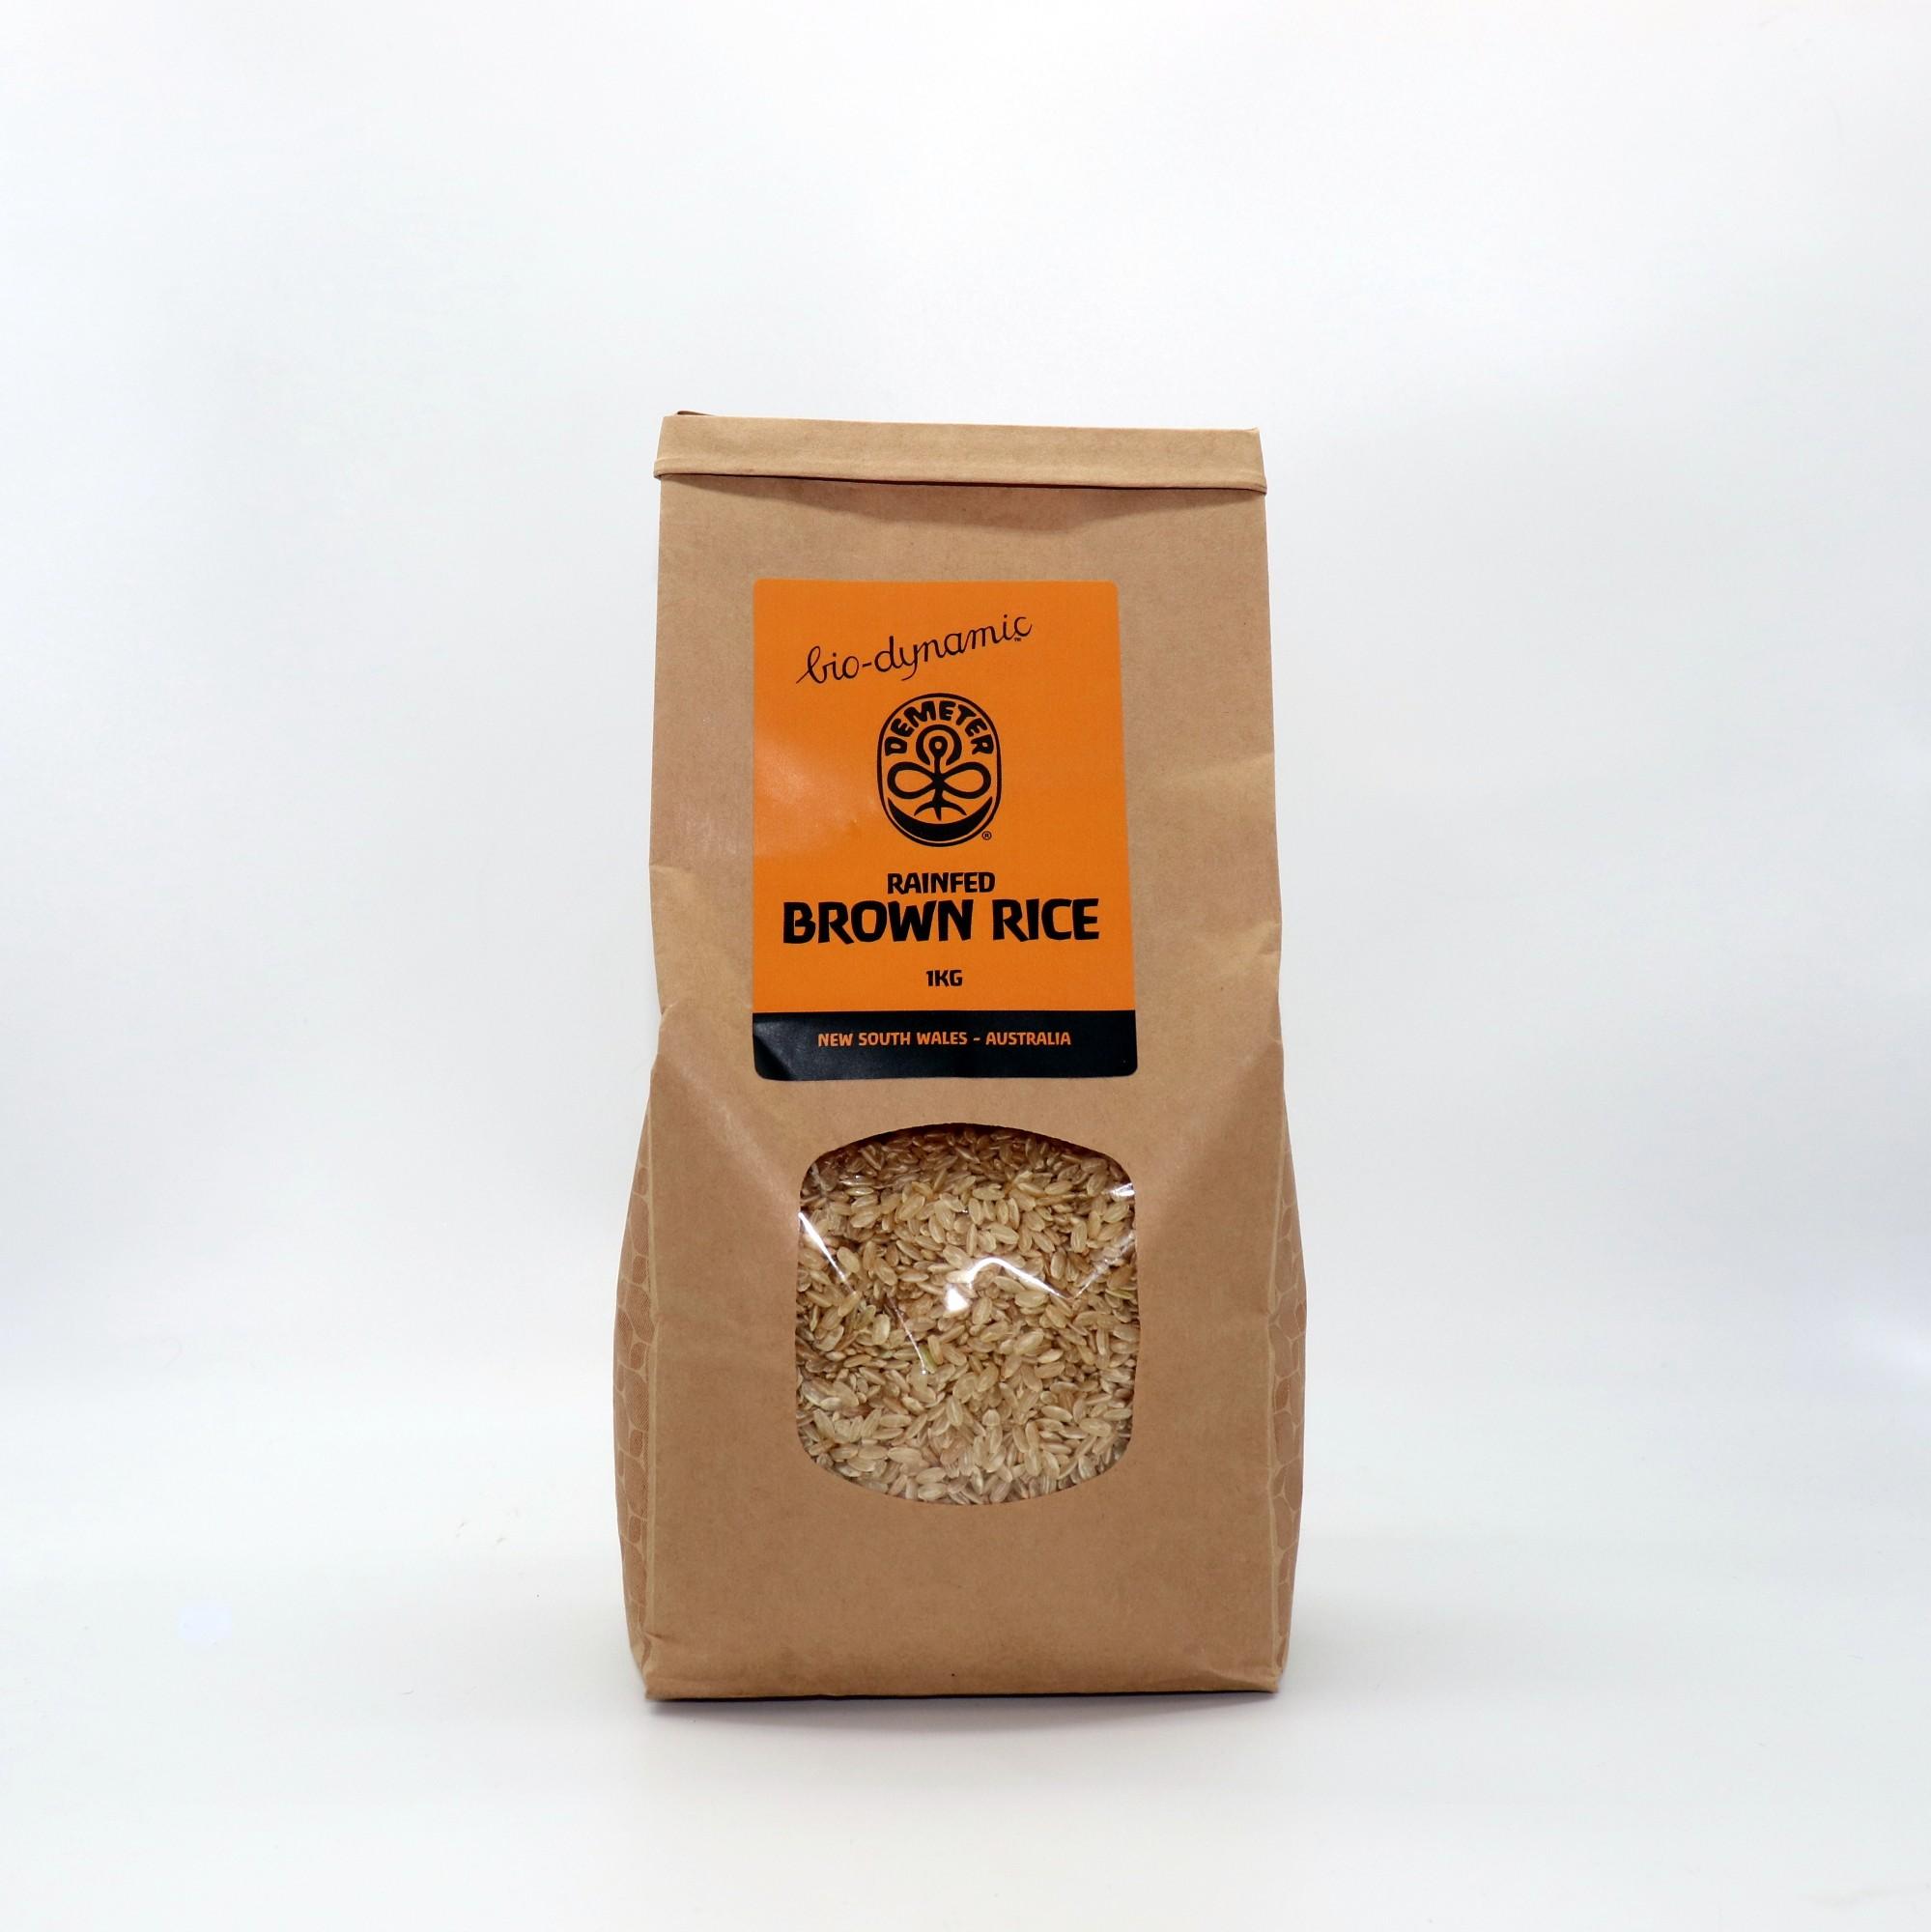 Biodynamic Rice Brown Rain Fed Demeter 1kg